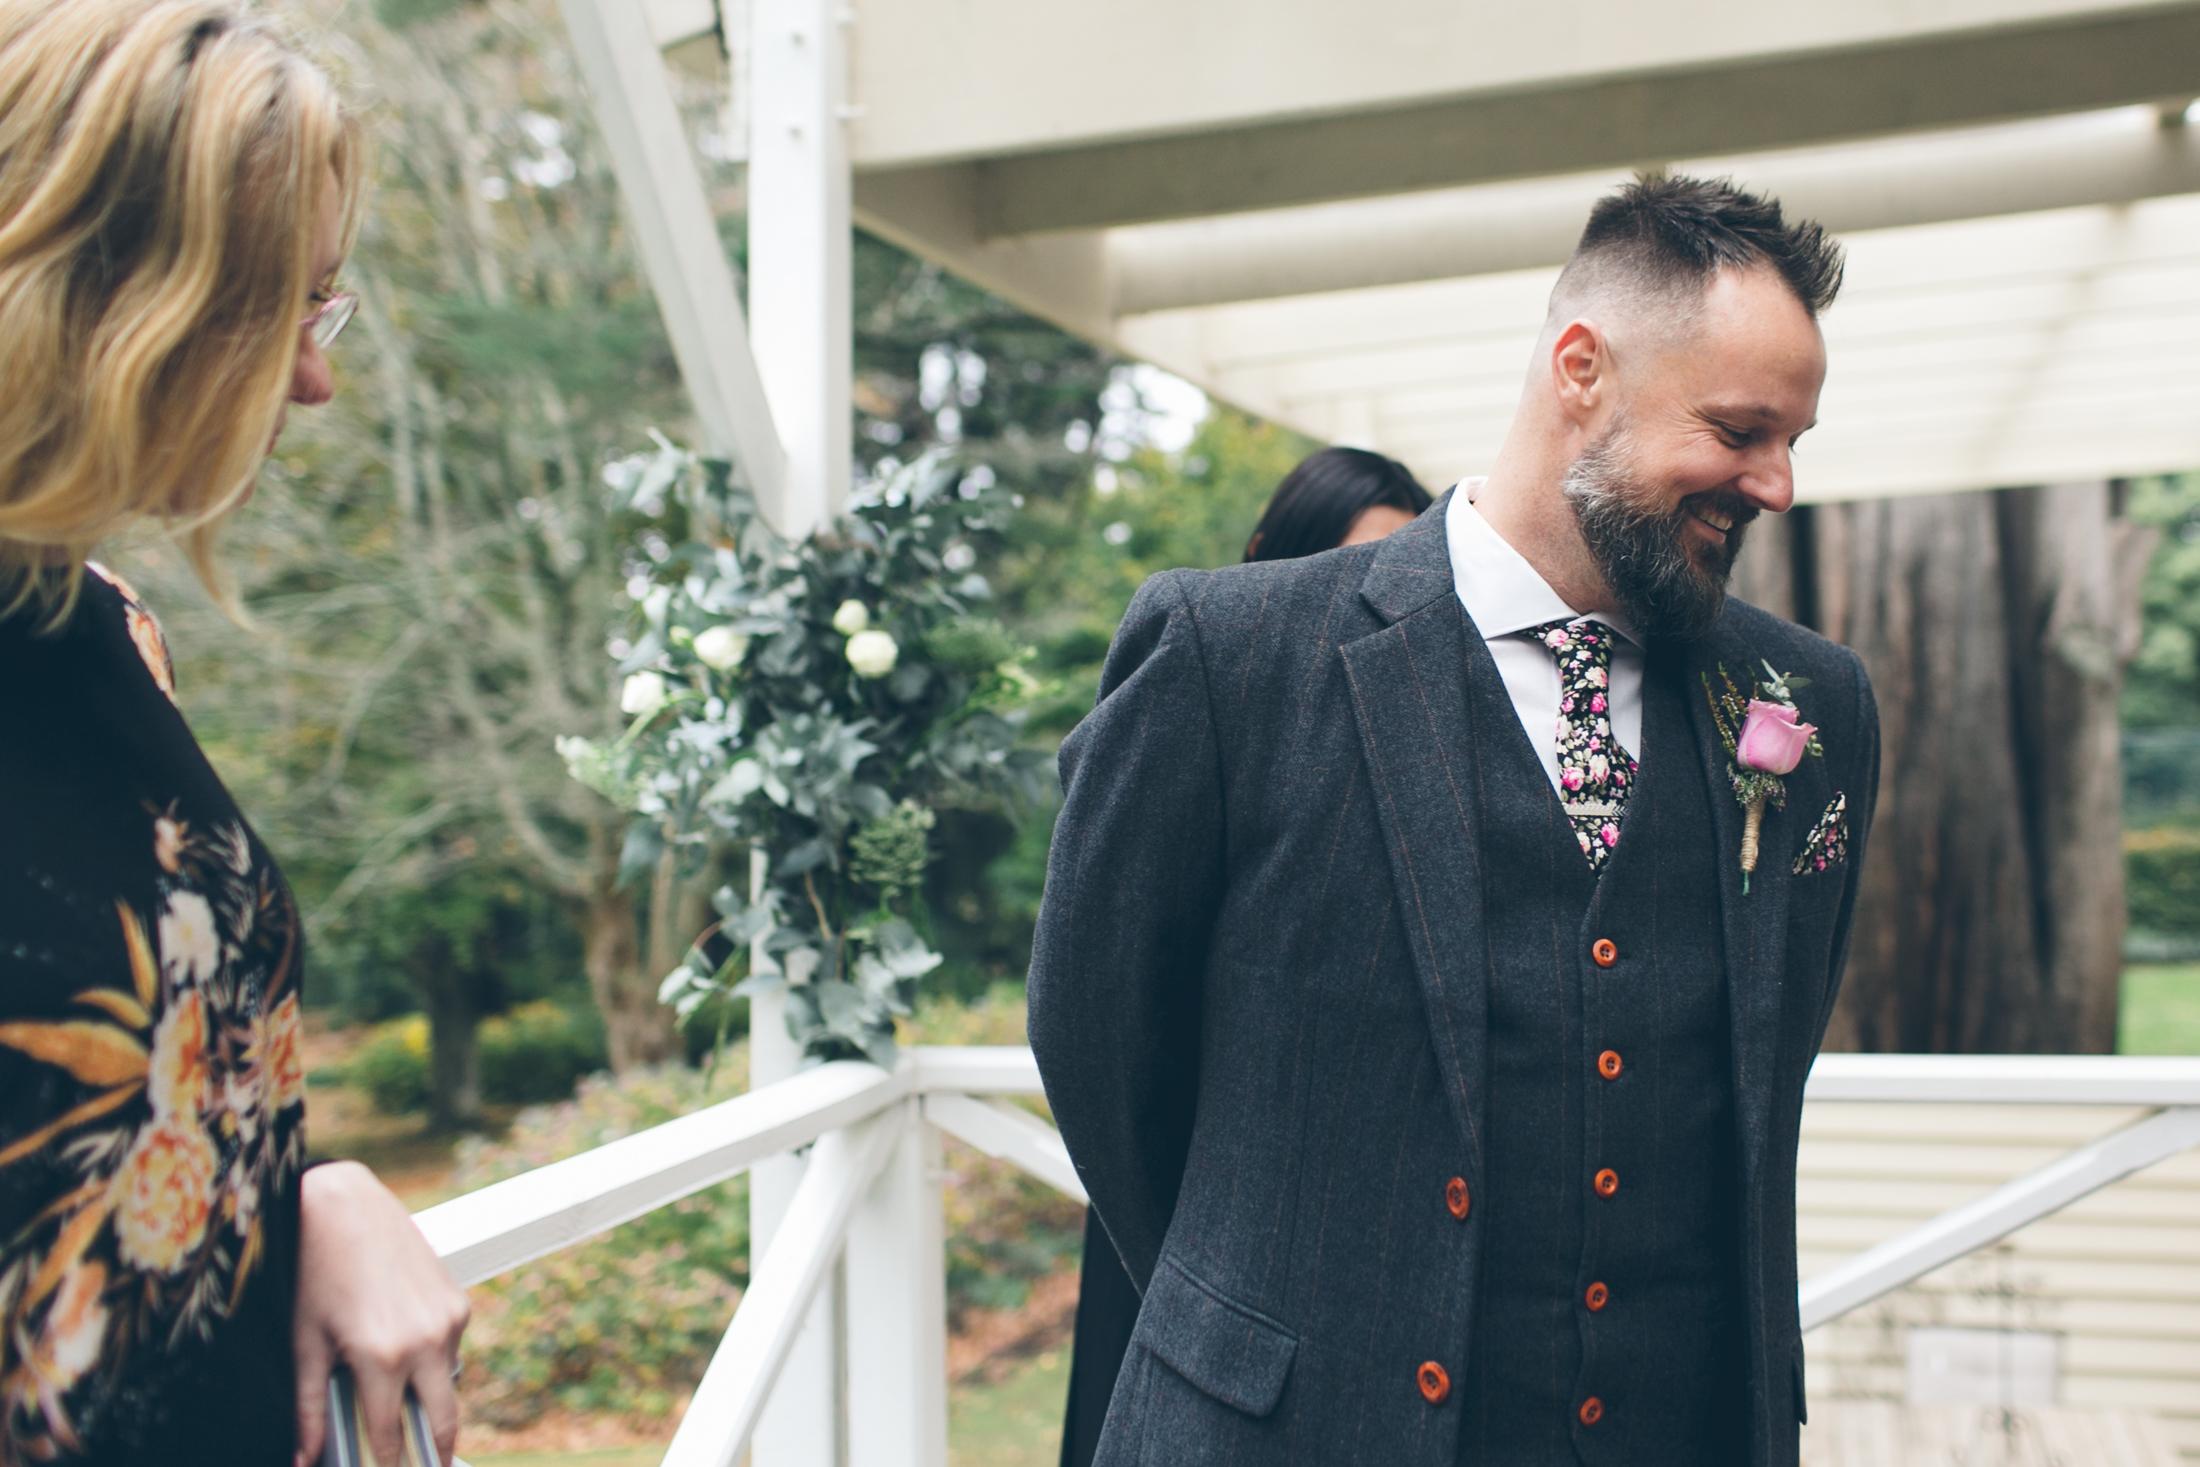 242_Michael_Will_Wedding.jpg